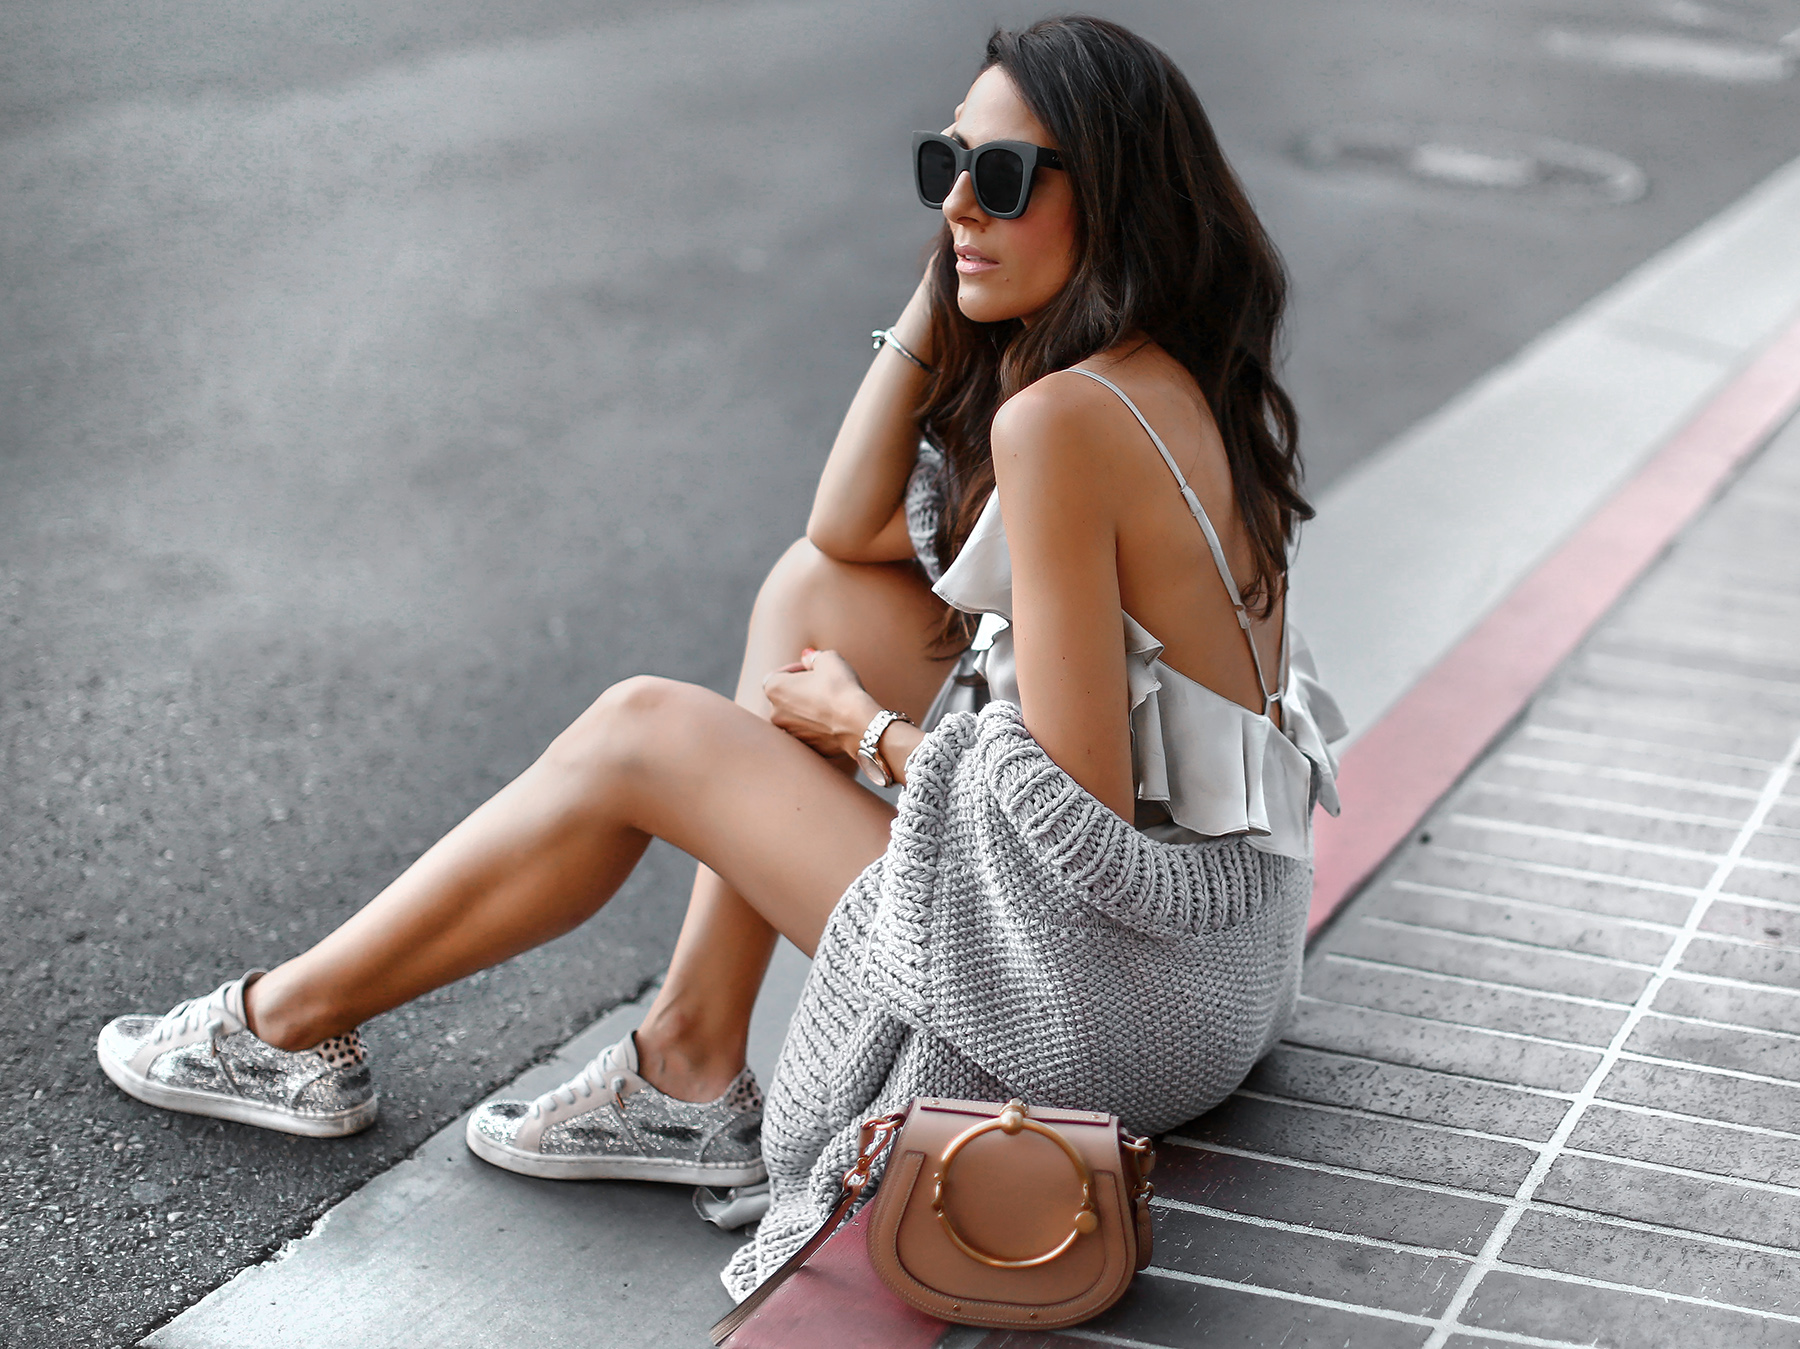 MLM Label Ruffle Dress_I_Love_Mister_Mittens_KImono_Sweater_Dolce_Vita_Sneakers_Chloe_Nile_Bag.jpg